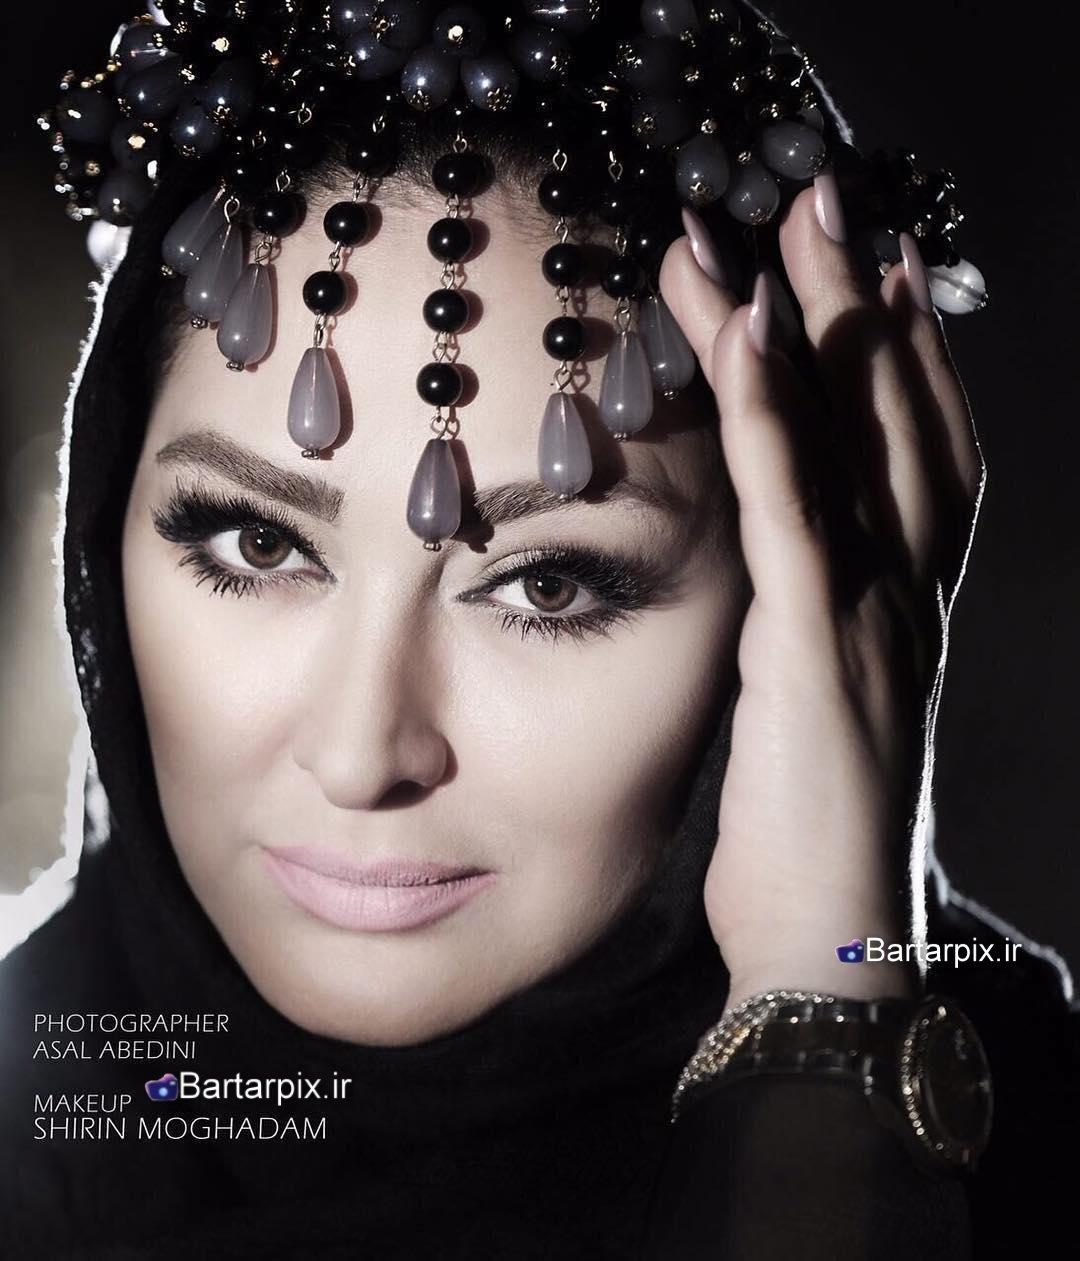 http://s7.picofile.com/file/8251160484/www_bartarpix_ir_elham_hamidi_95_8_.jpg